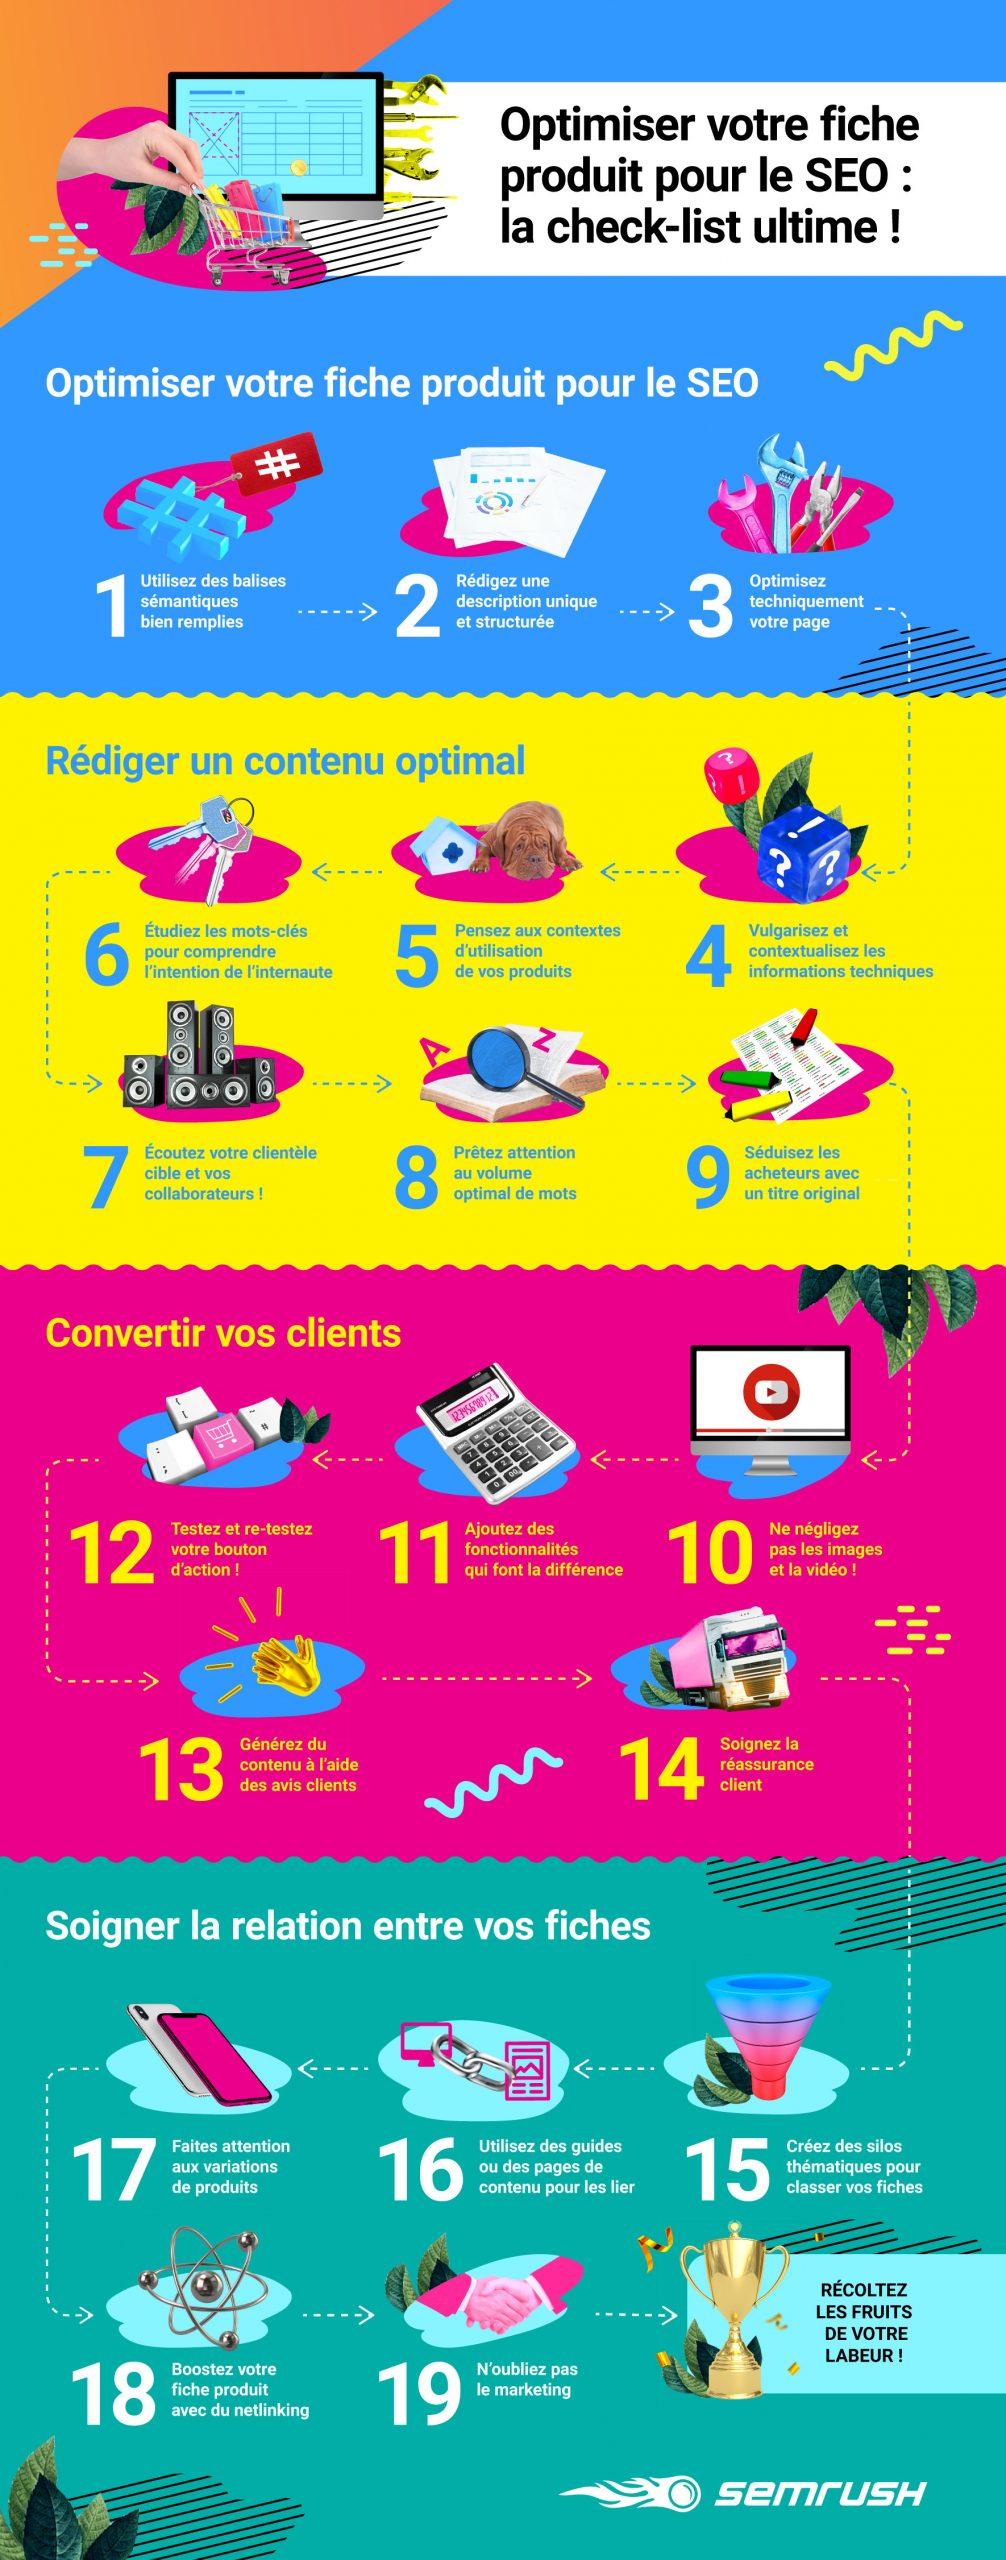 Infographie Qwanturank